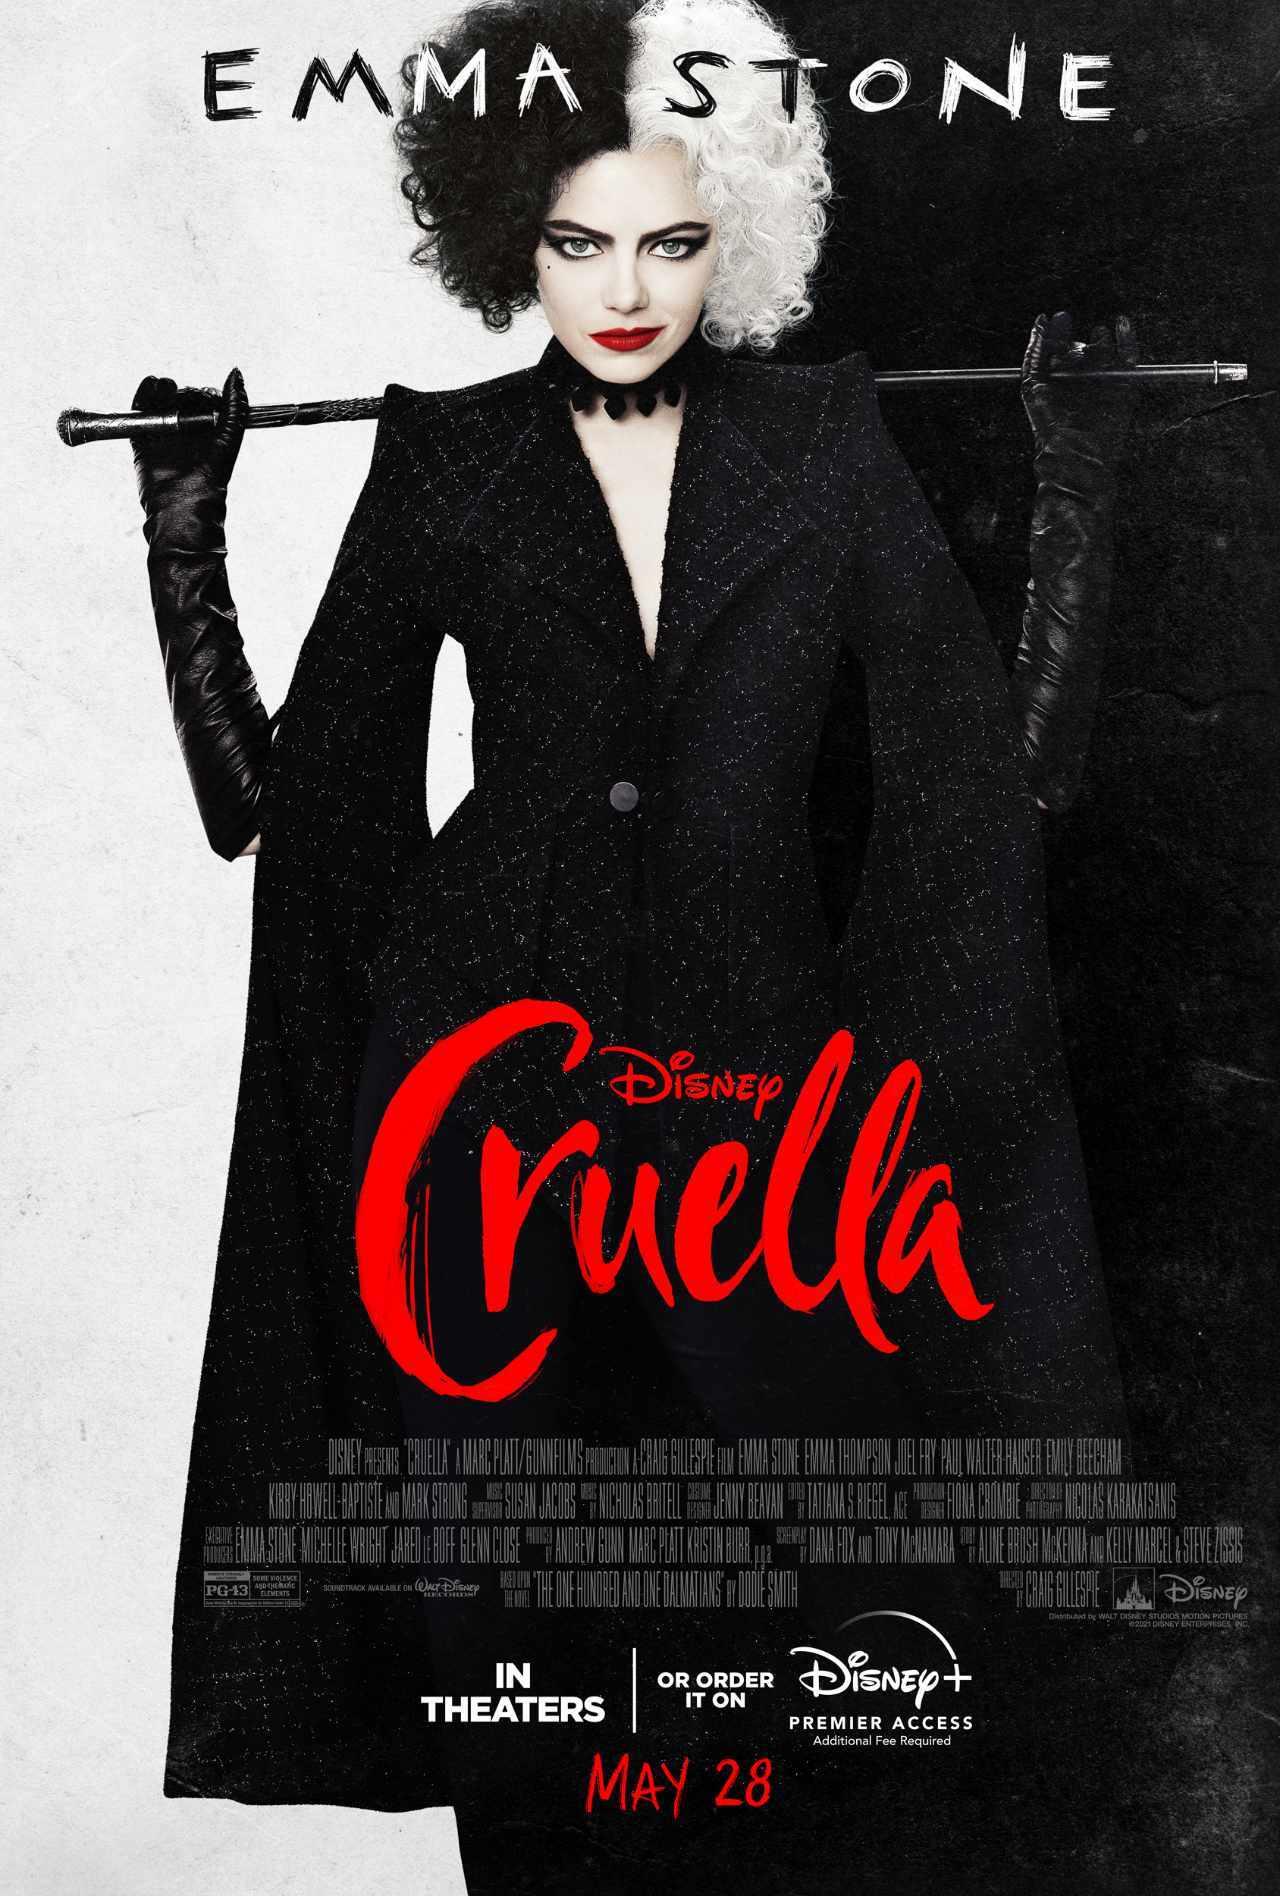 Cruella DIsney Poster